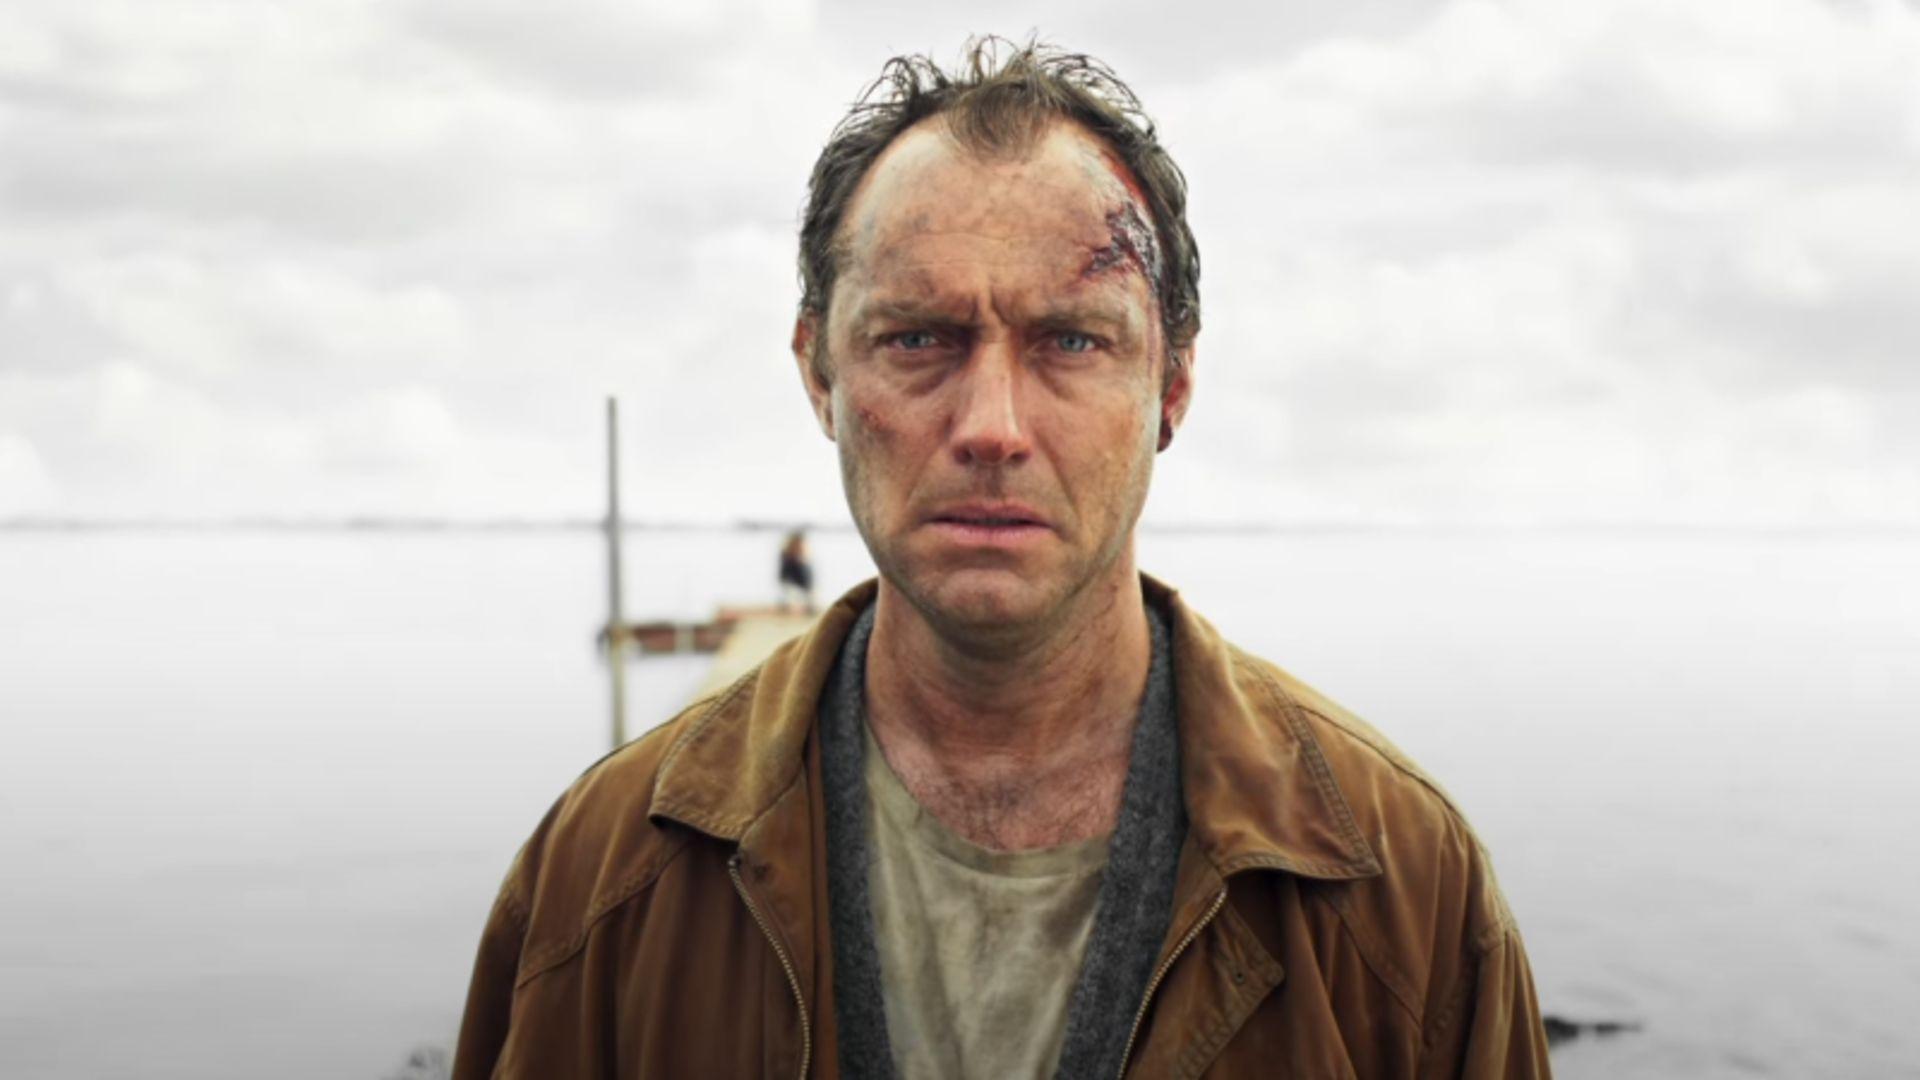 HBO-miniserie 'The Third Day' met Jude Law vanaf vandaag op Ziggo Films & Series